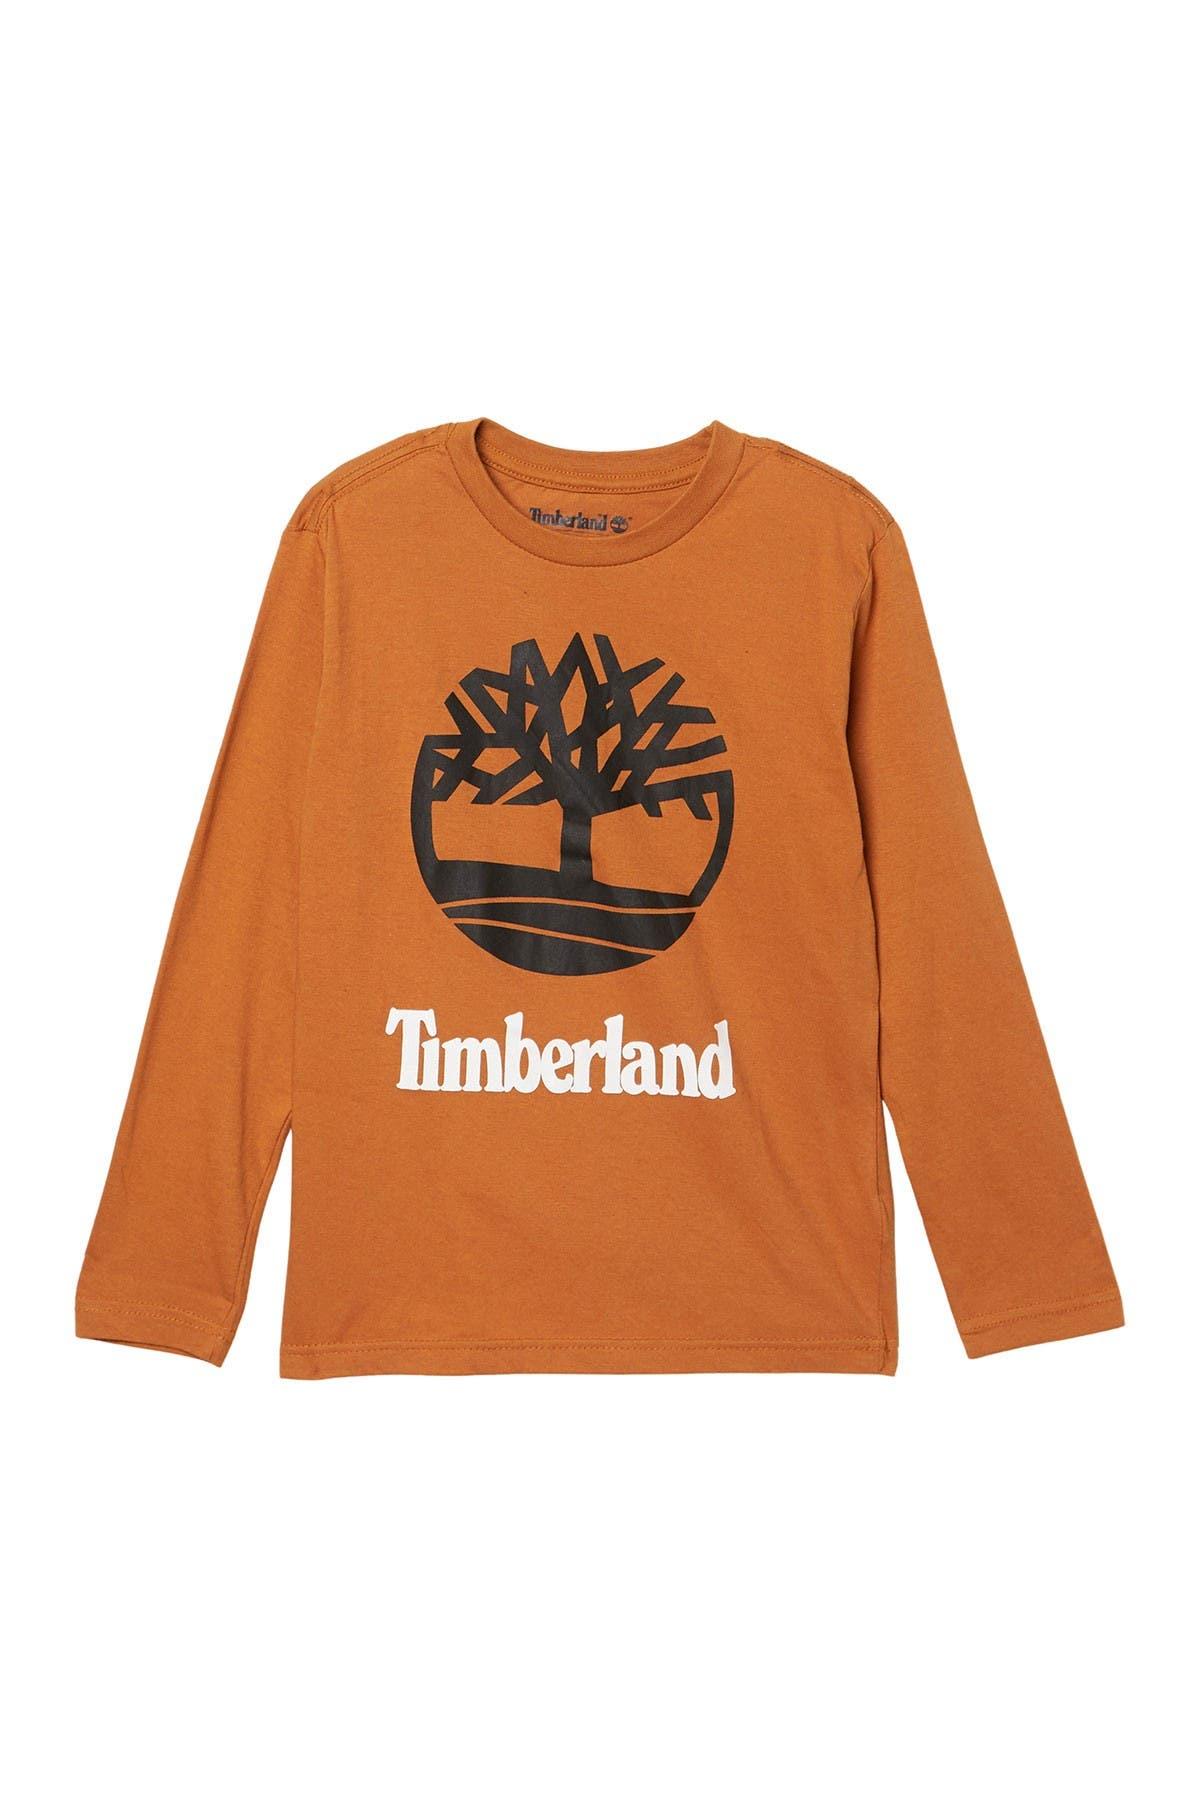 kids timberland clothes